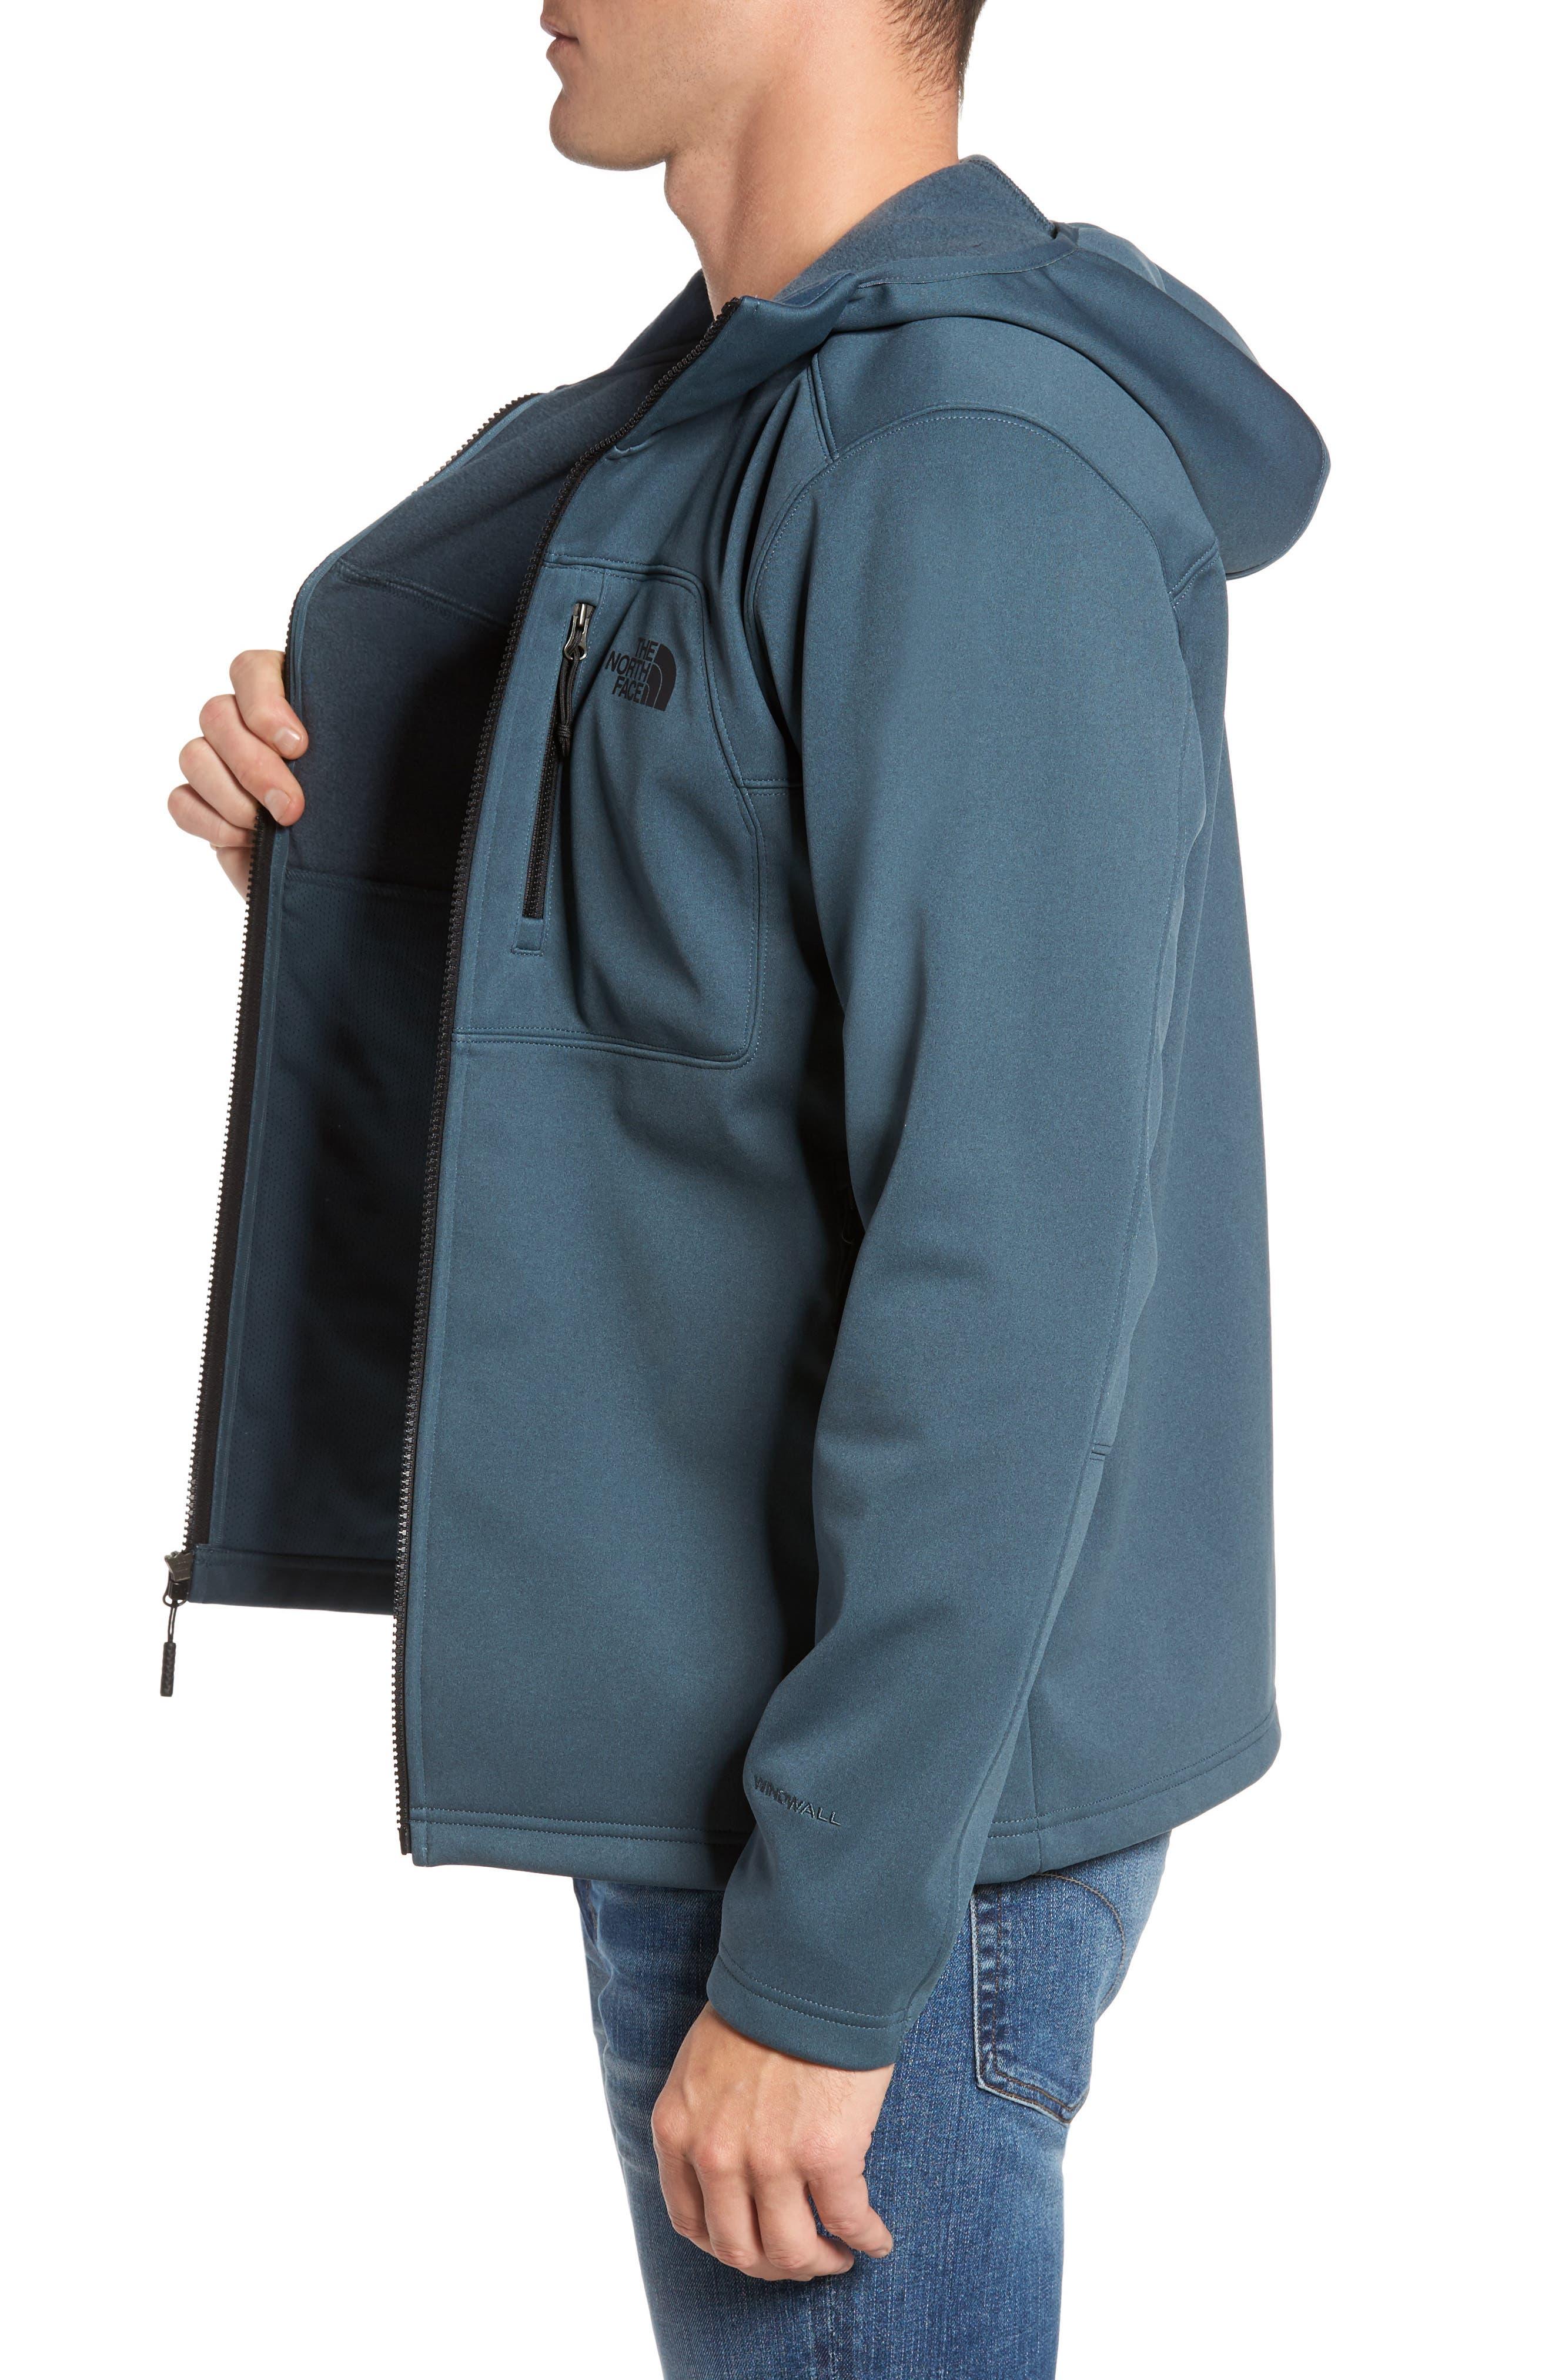 Apex Risor Jacket,                             Alternate thumbnail 3, color,                             Conquer Blue Heather